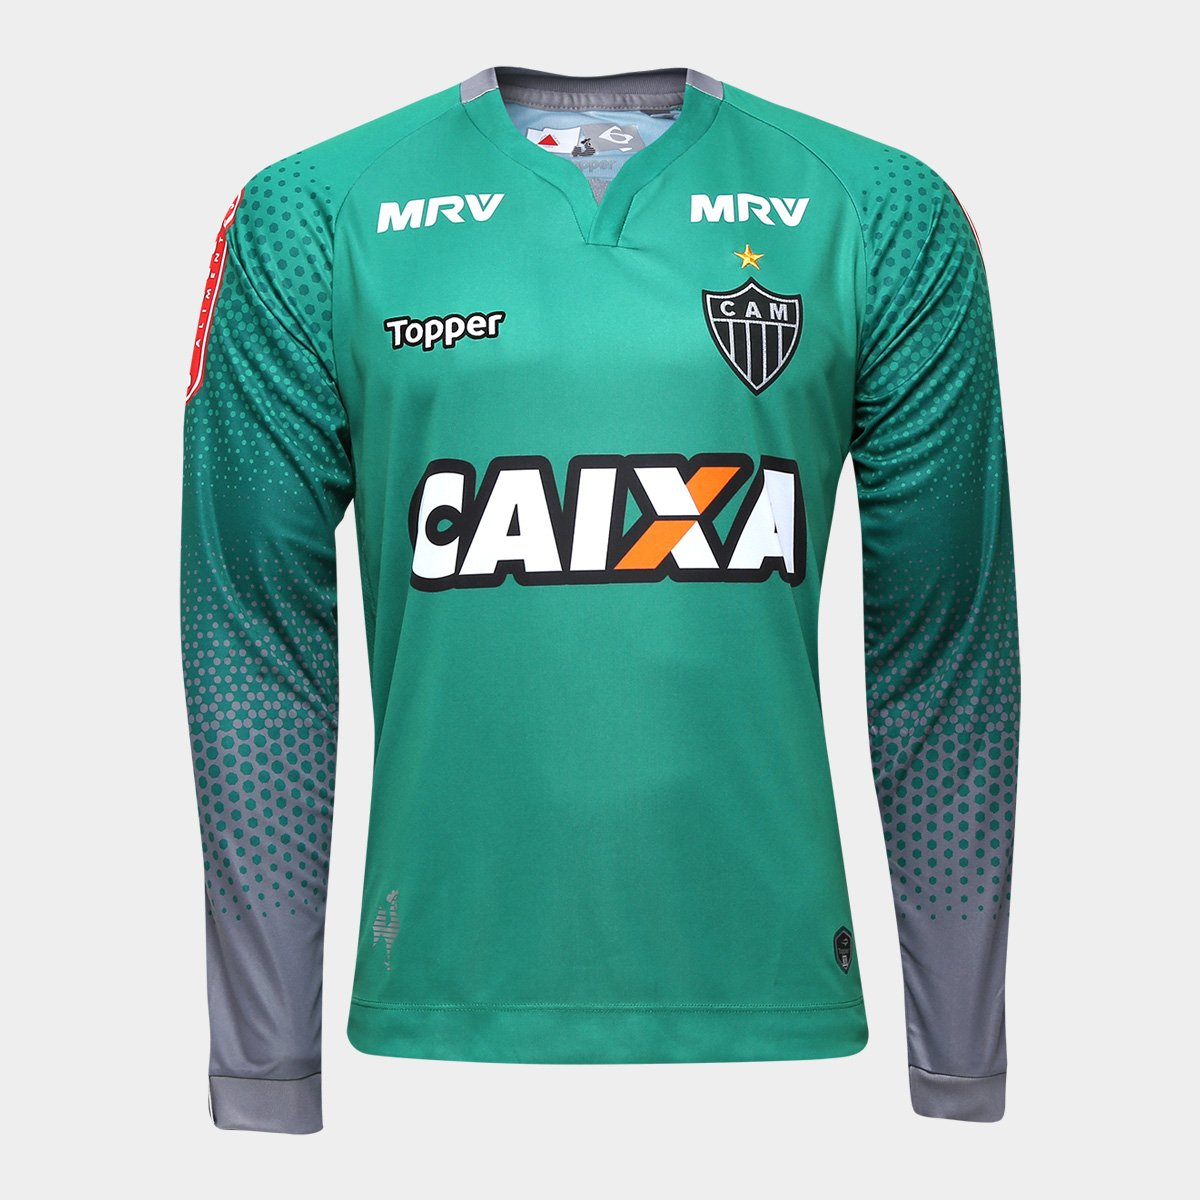 Camisa Atlético-MG Goleiro III 17 18 Manga Longa nº 1 - Torcedor Topper  Masculina - Compre Agora  6b5f5c205431b